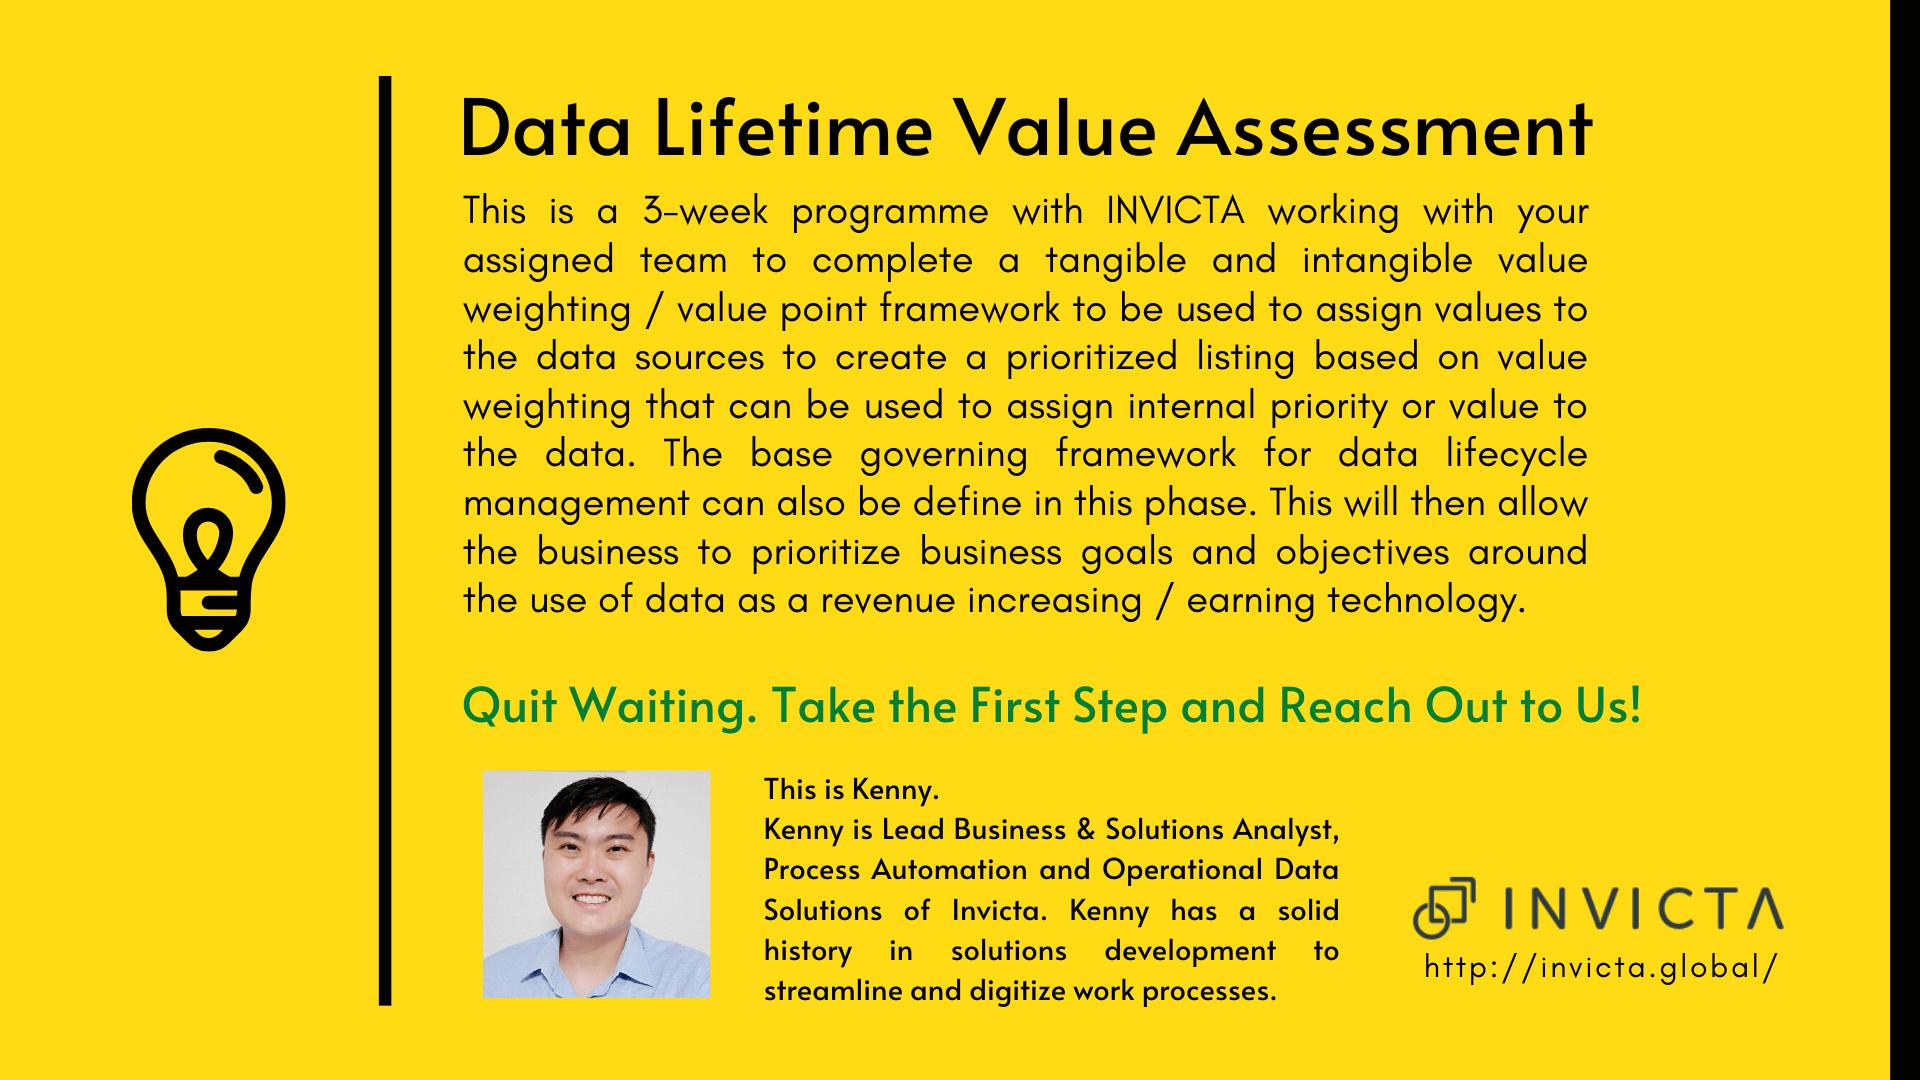 Innovation - Data Assessment Invicta Singapore